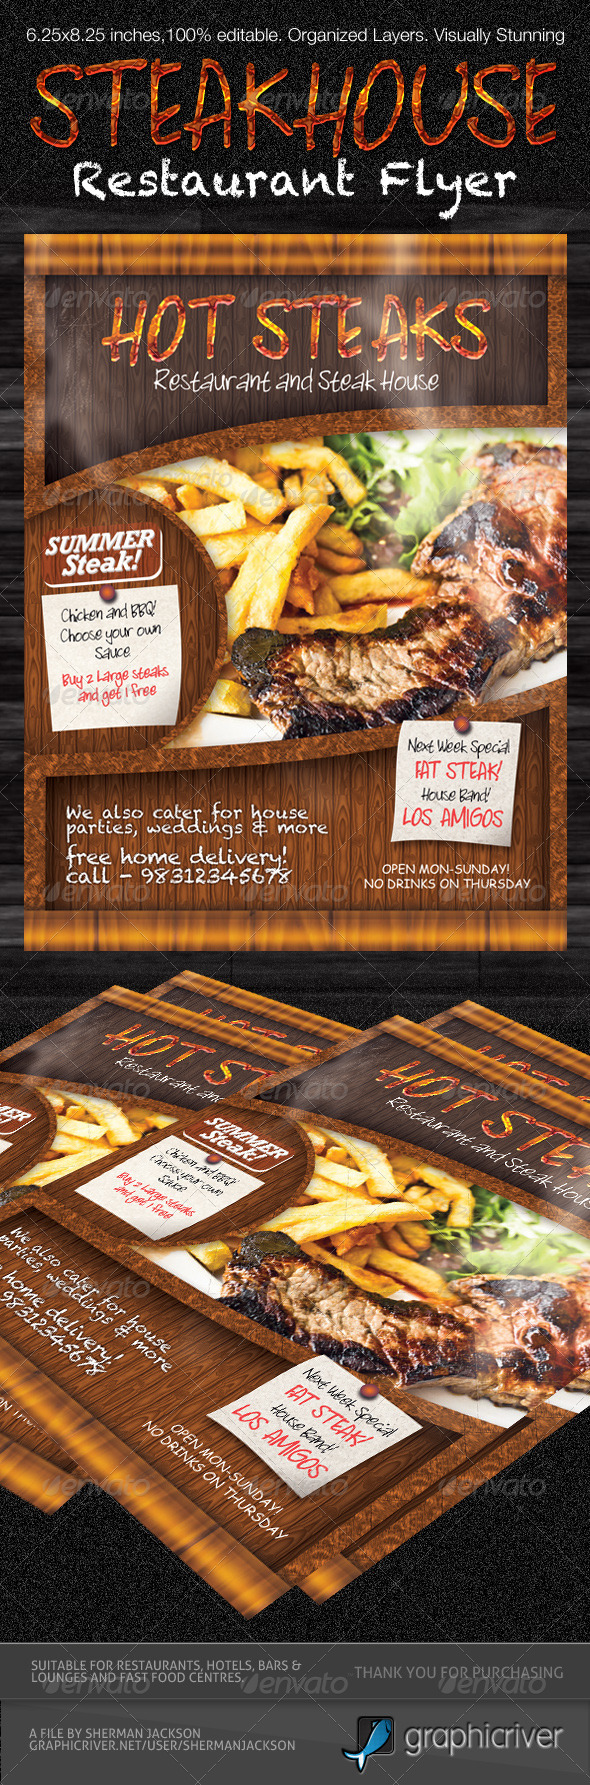 Restaurant Steak House Flyer PSD Template - Restaurant Flyers